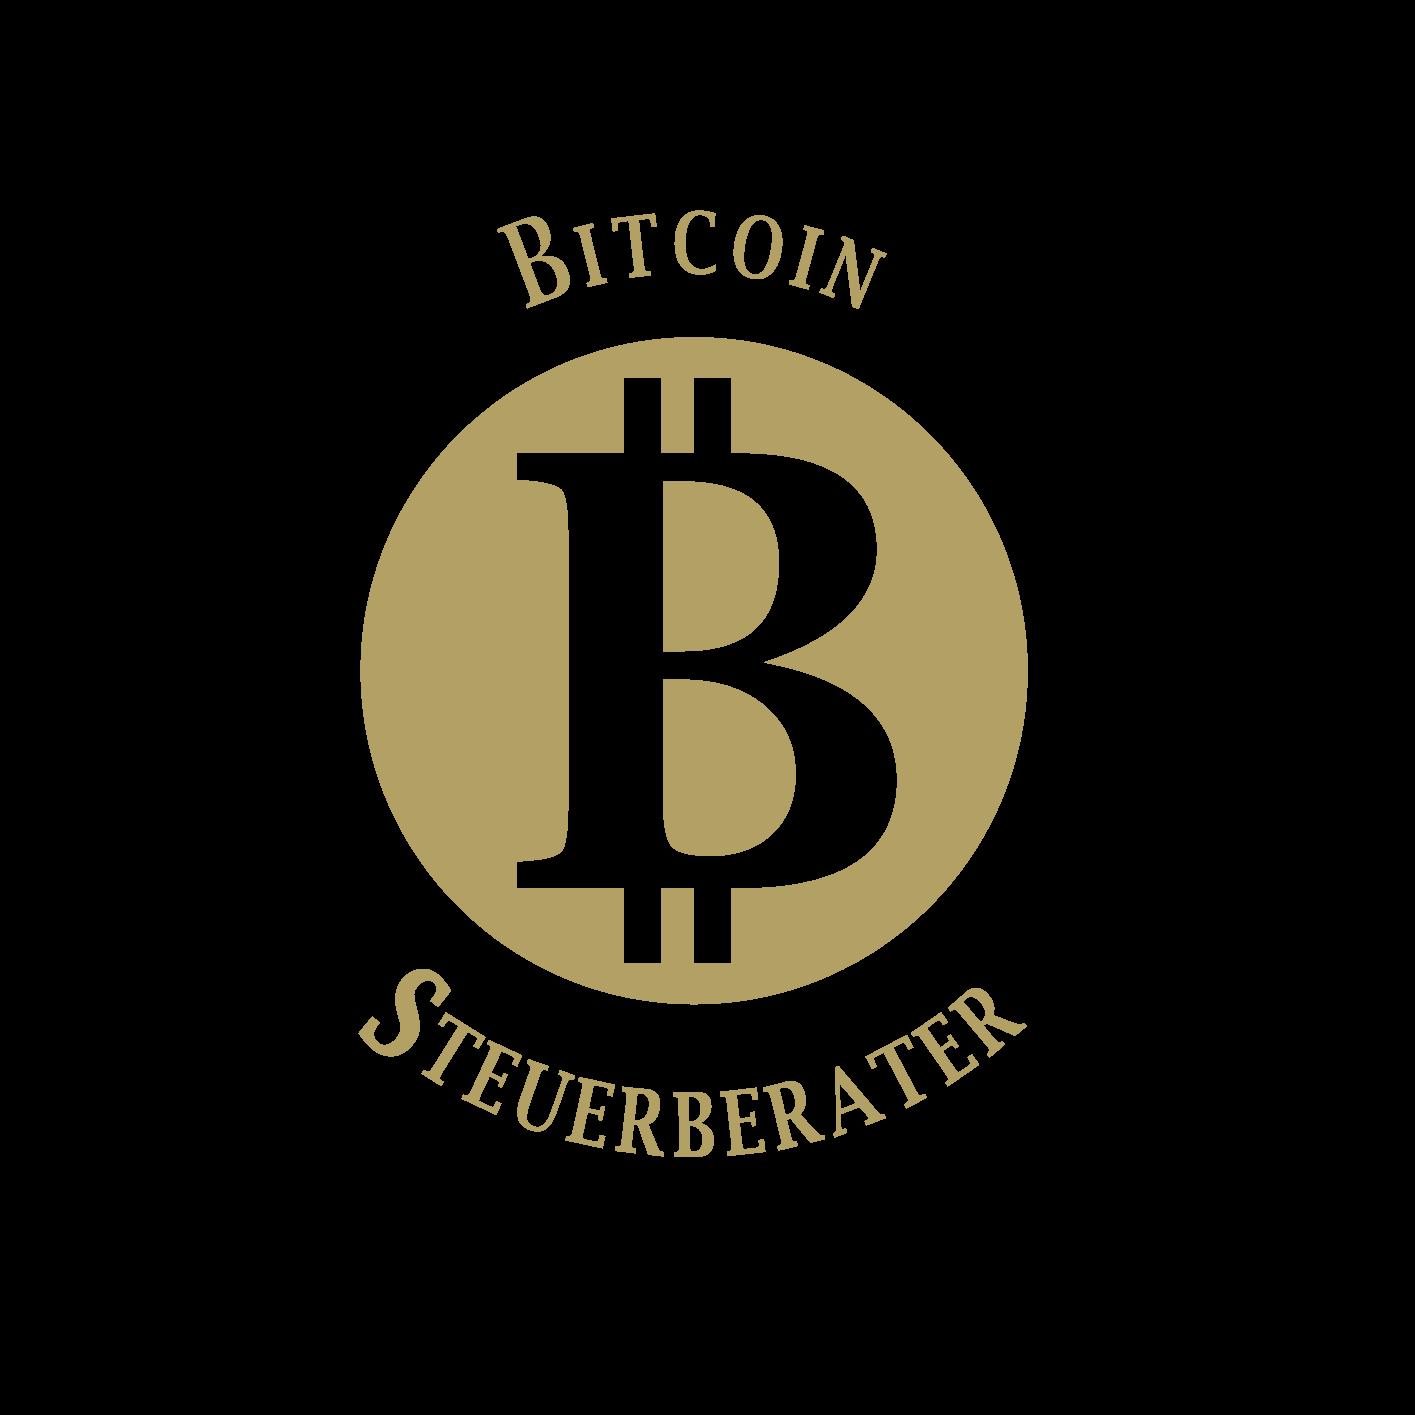 Matthias Steger Krypto-Steuerexperte Steuerberater Bitcoin